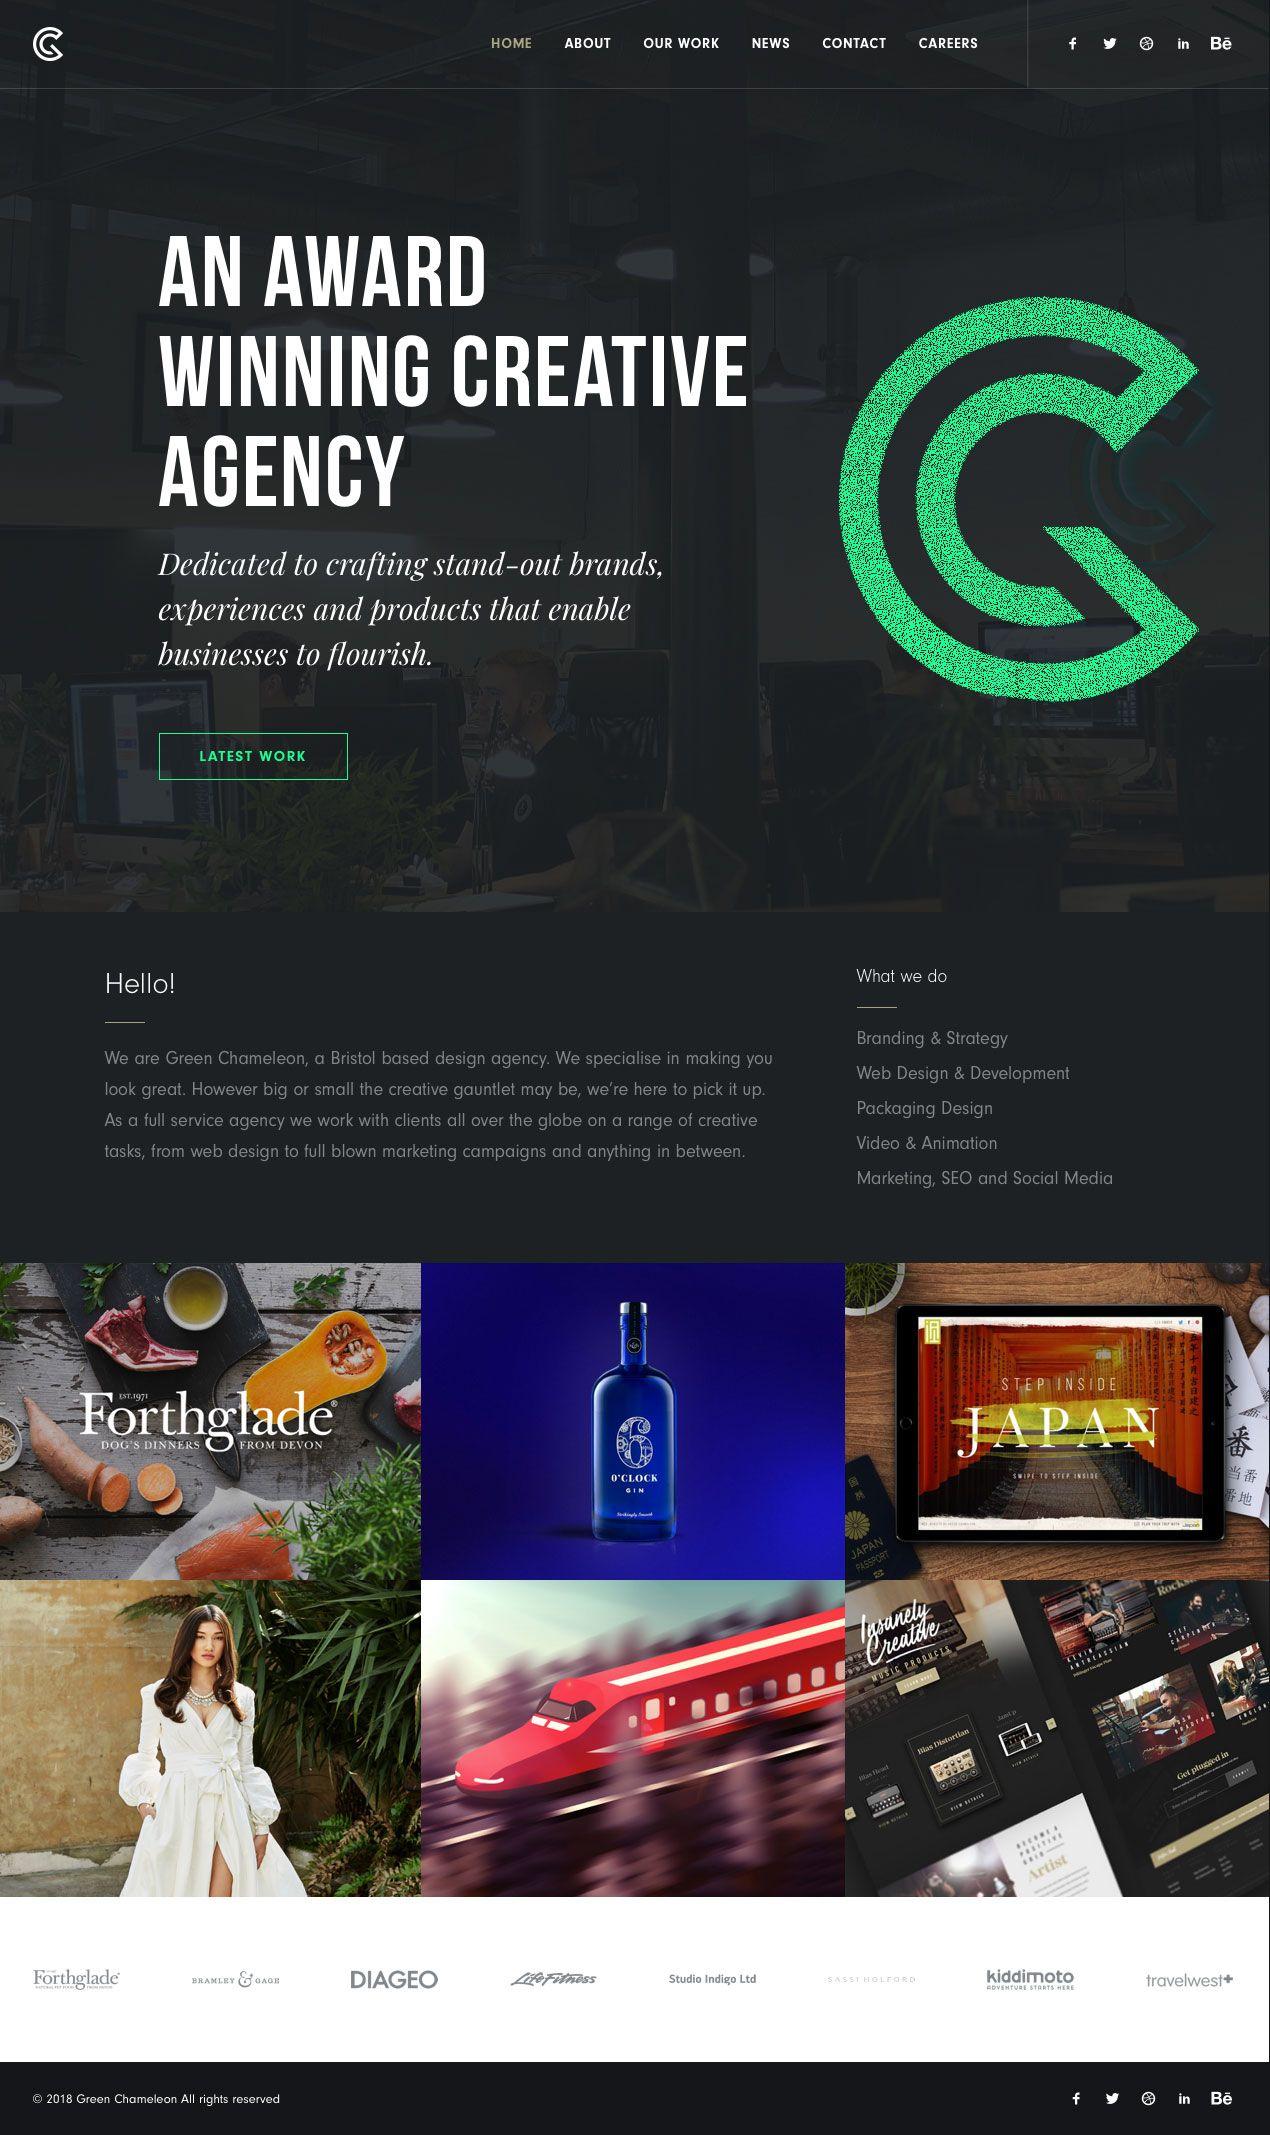 Green Chameleon Landing Page Design Inspiration Lapa Ninja Landing Page Design Best Landing Page Design Page Design